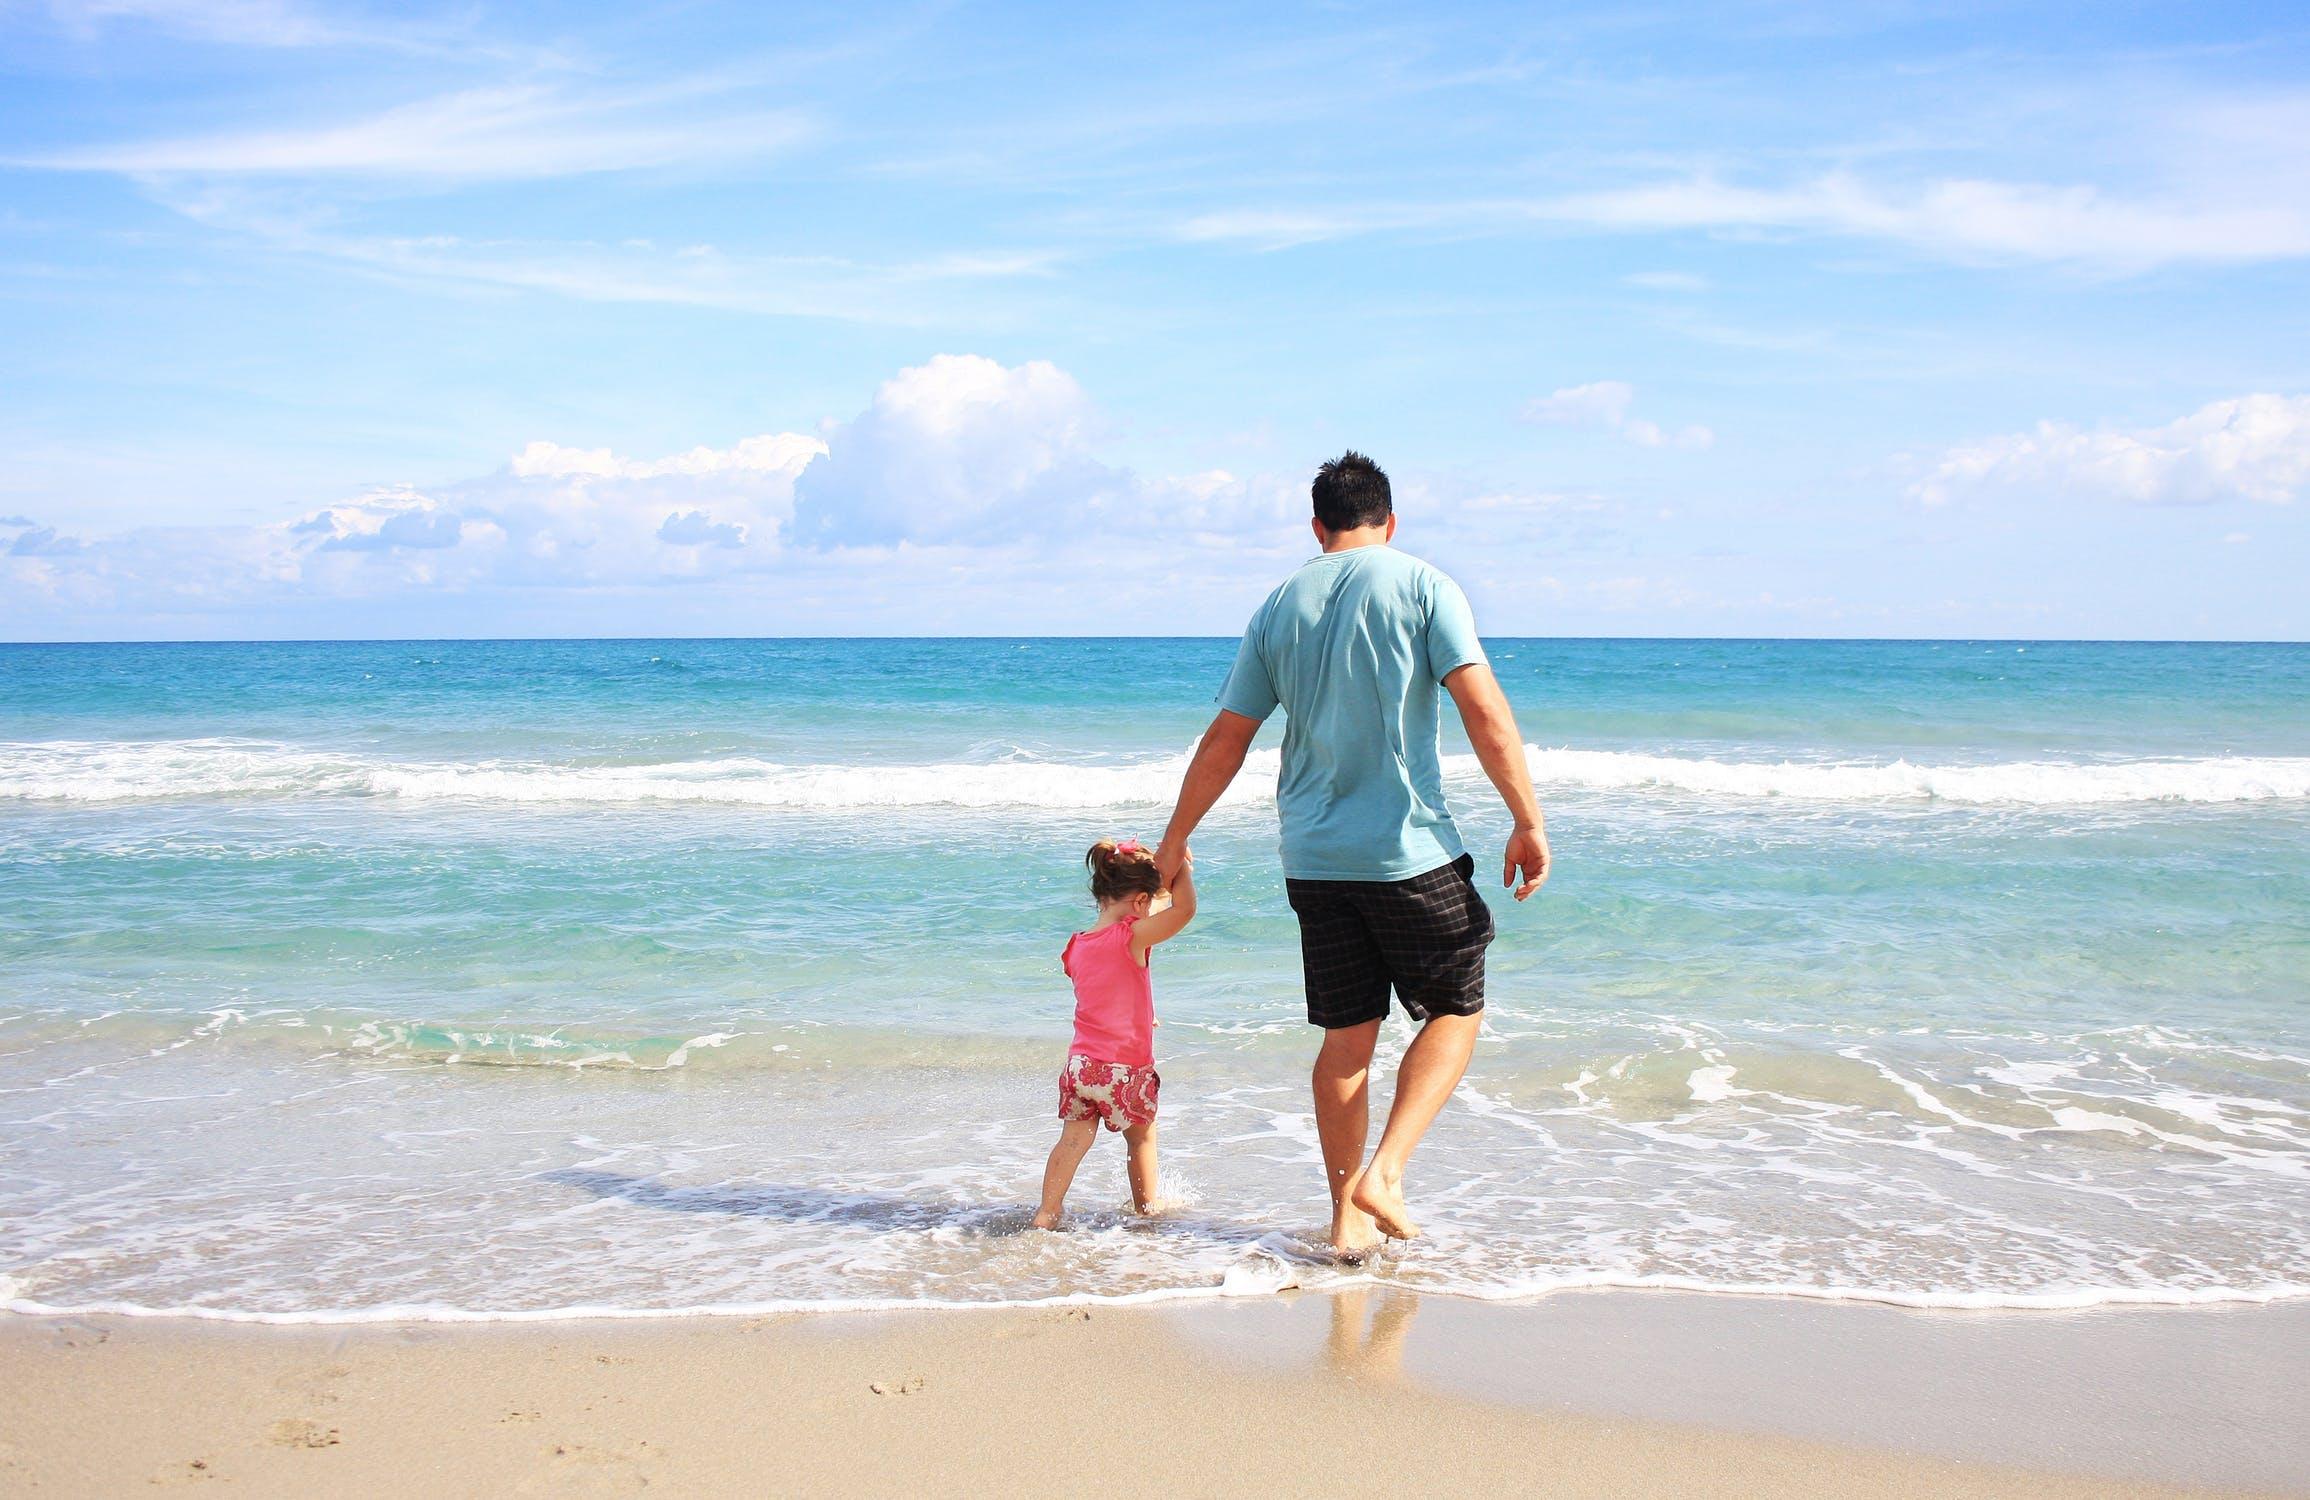 father-daughter-beach-sea-38302.jpg